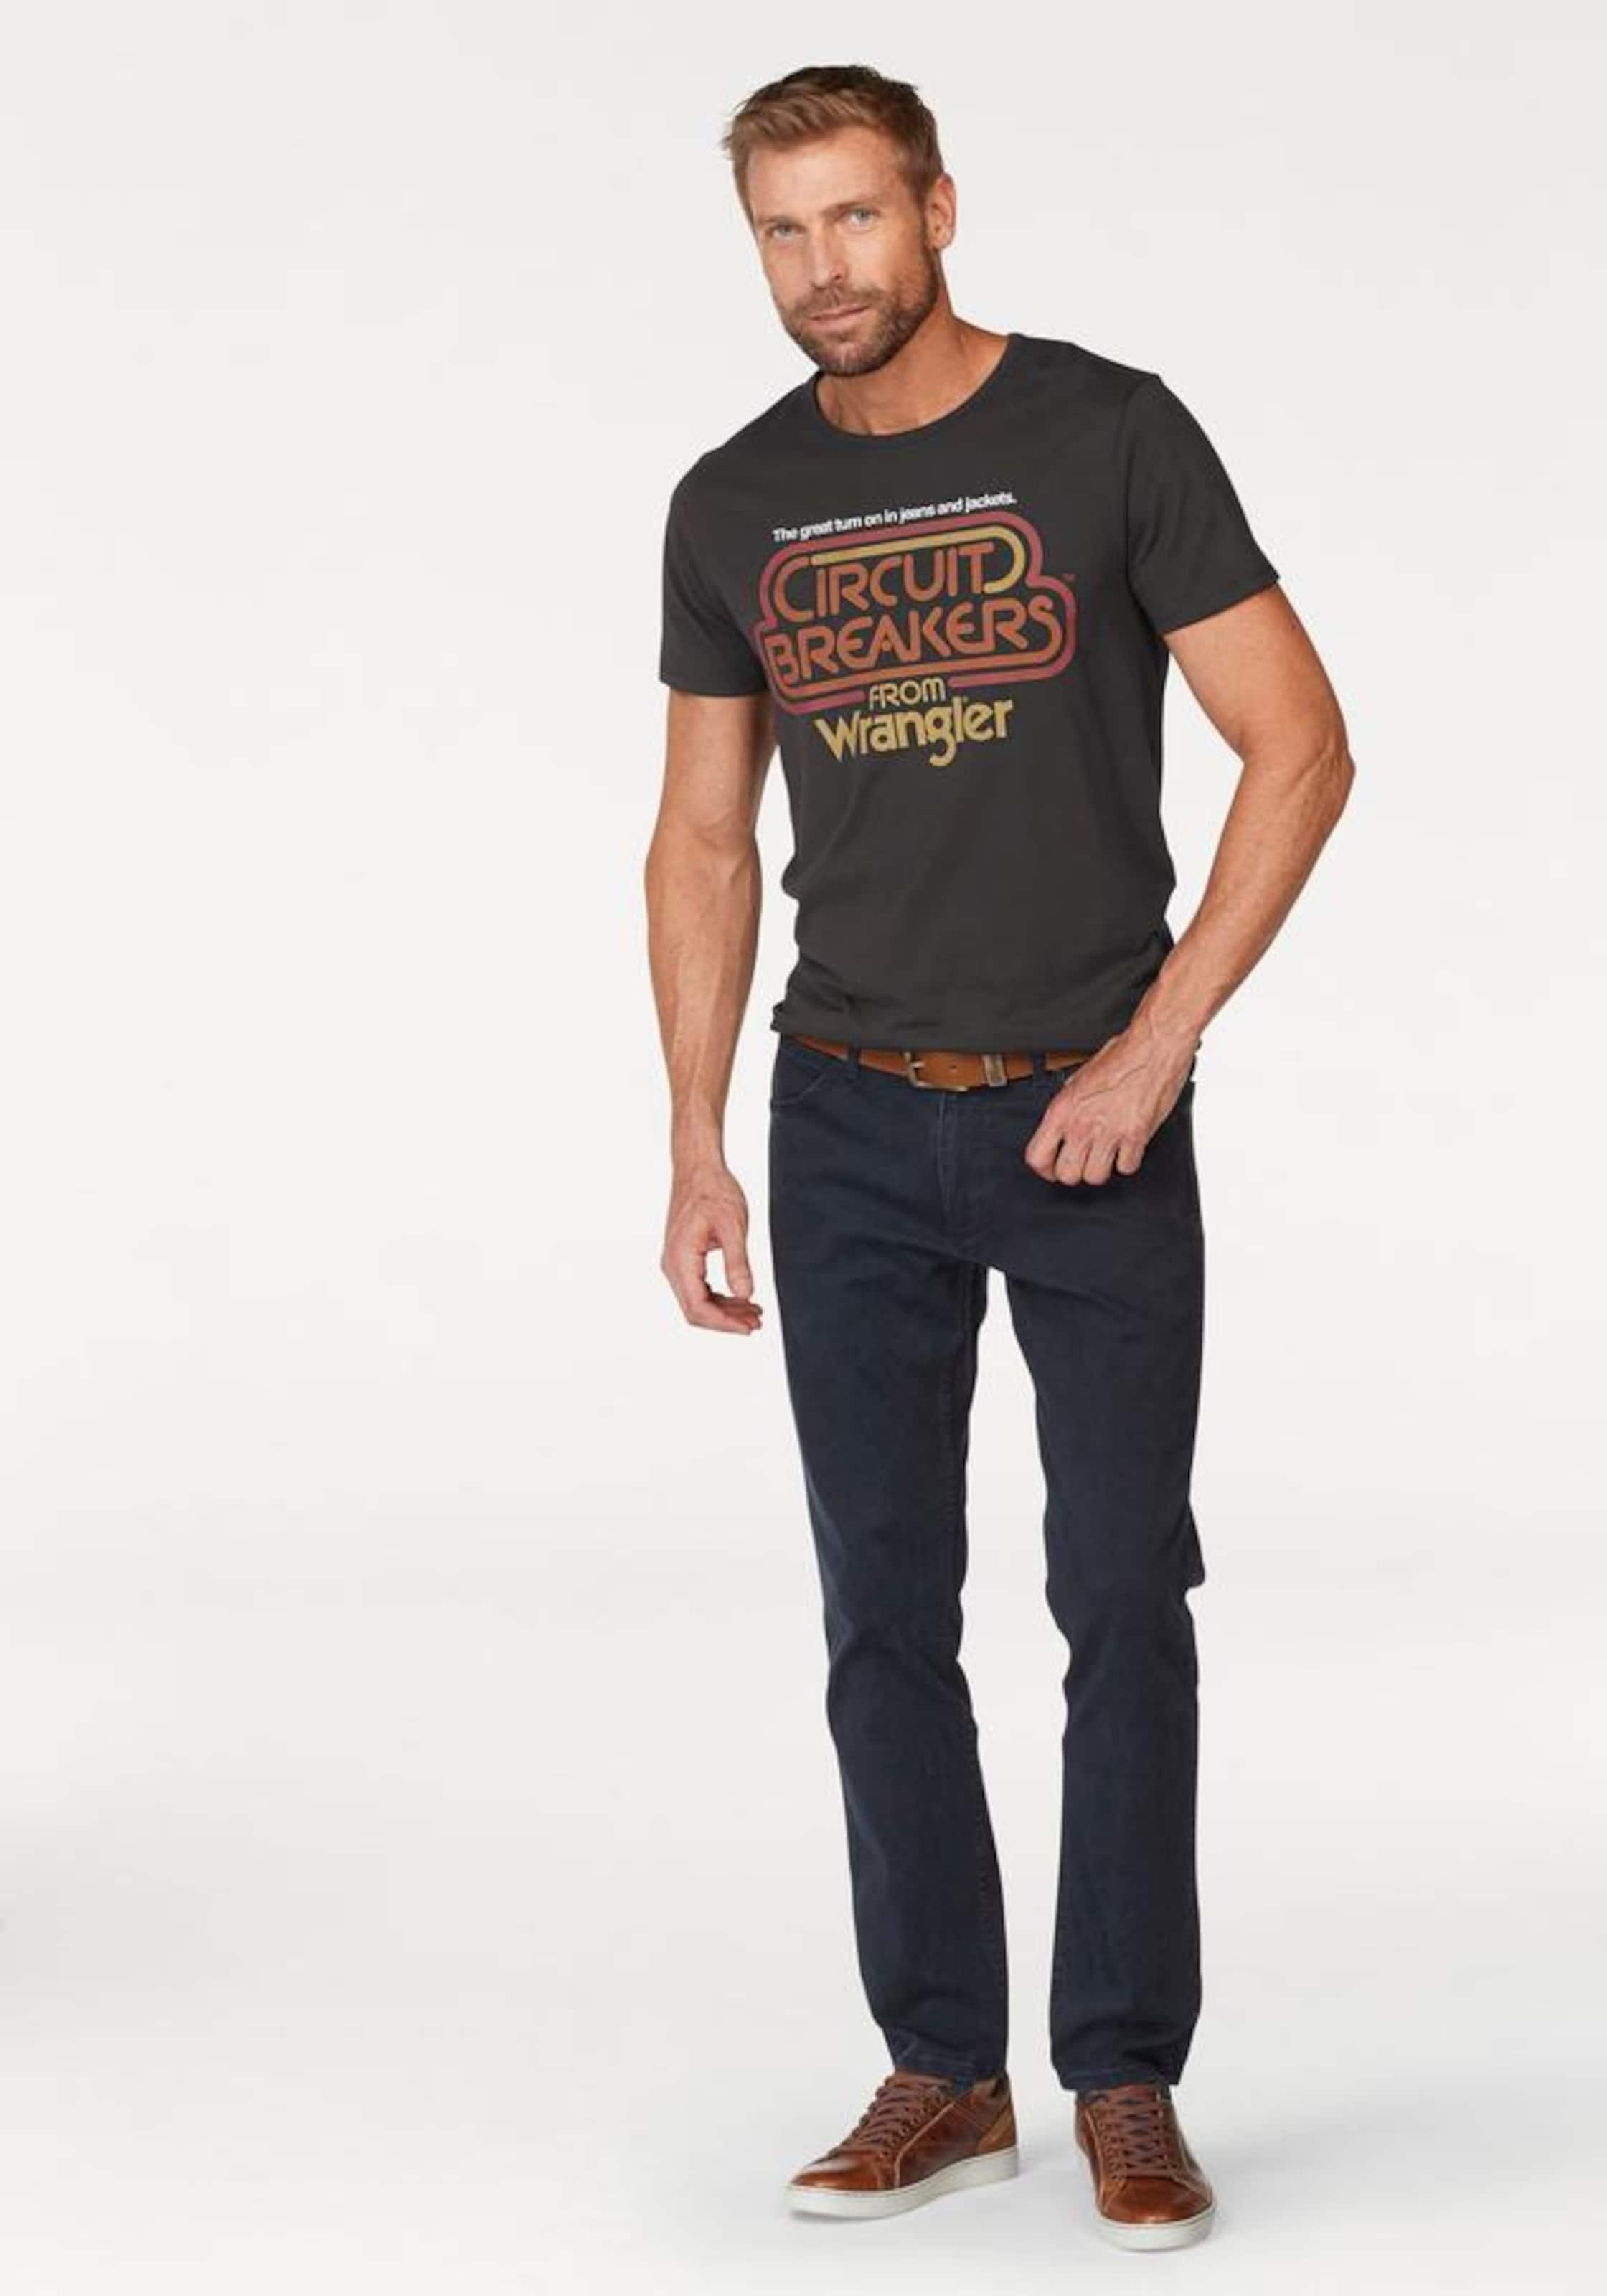 WRANGLER 'Circuit Shirt WRANGLER 'Circuit Tee' Tee' T T Shirt WRANGLER 6IxtqFUqw